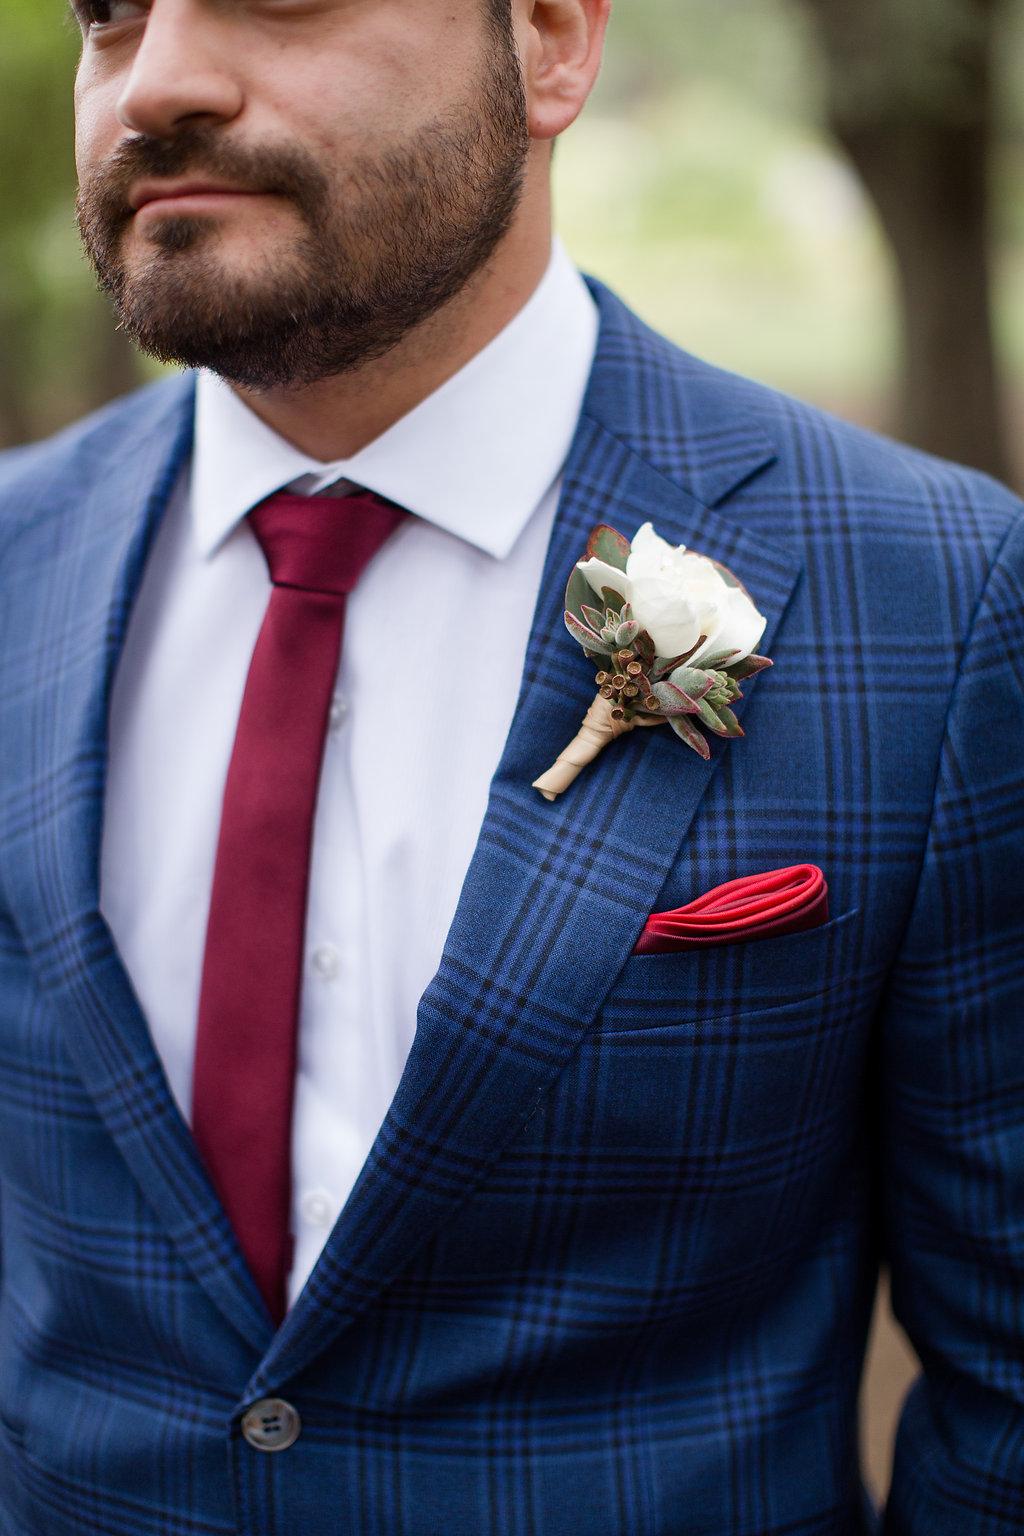 Saddlerock Ranch Malibu Wedding Venue — The Overwhelmed Bride Wedding Blog